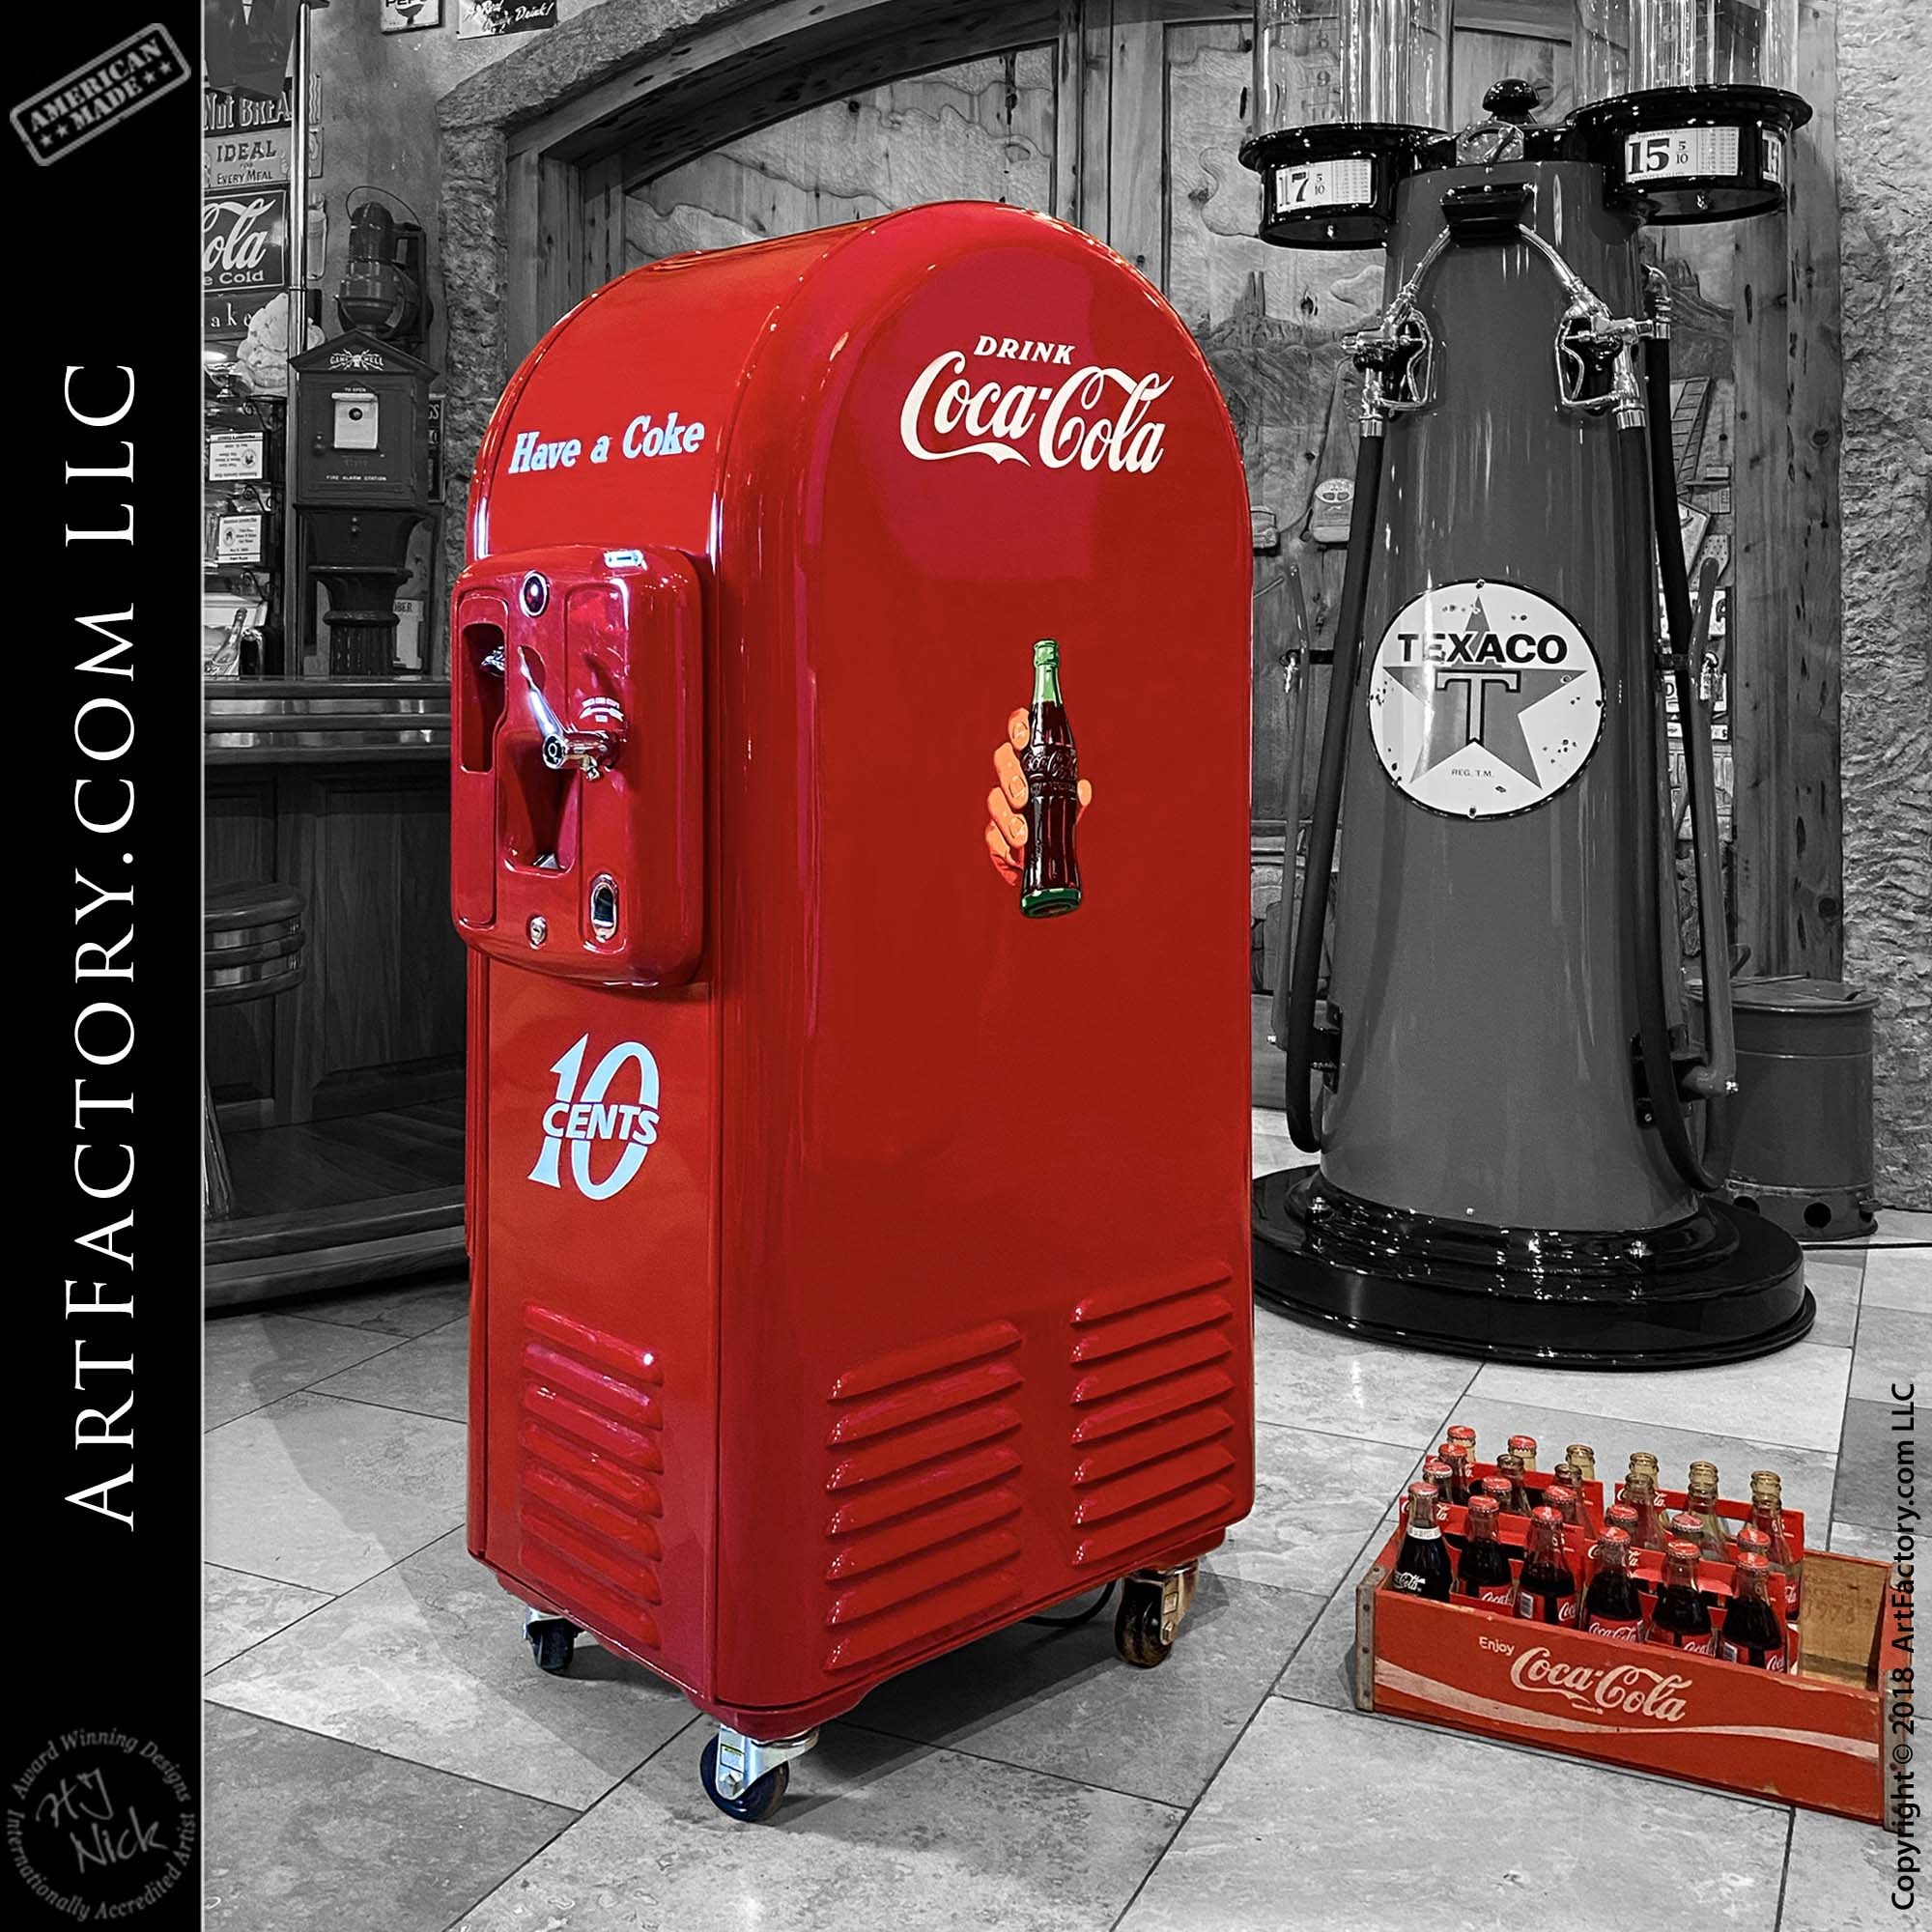 Vintage Jacobs Coca-Cola Vending Machine - Vendo 26